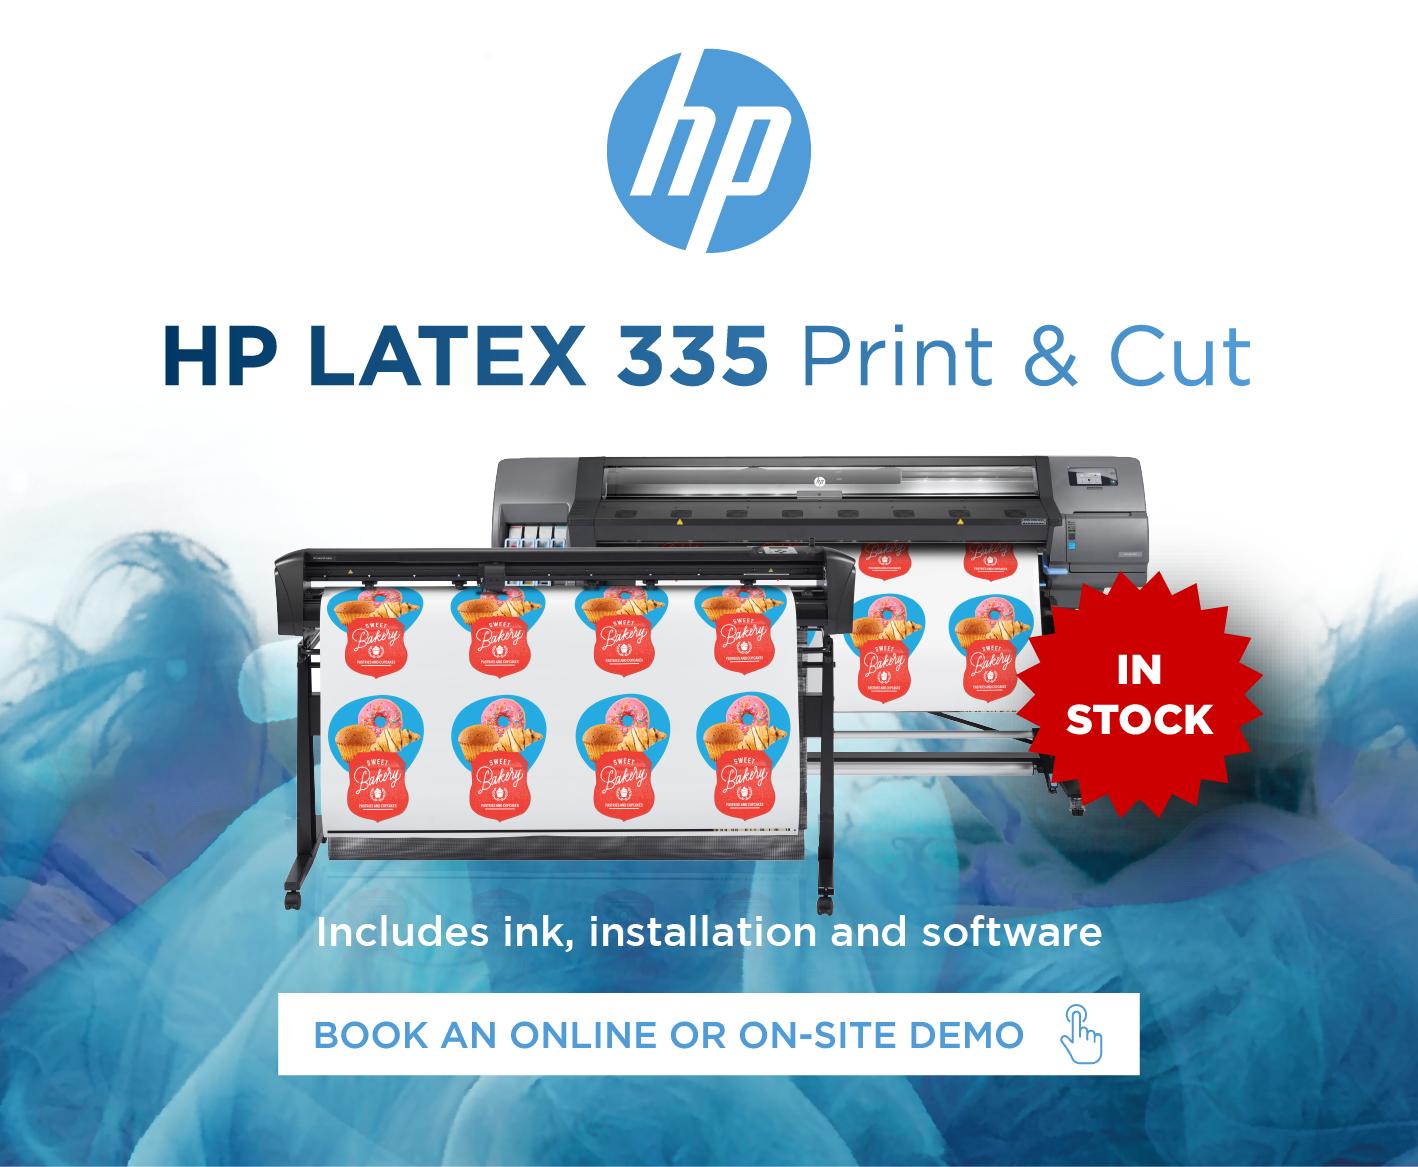 Midcomp_SideLarge_HPlatex335